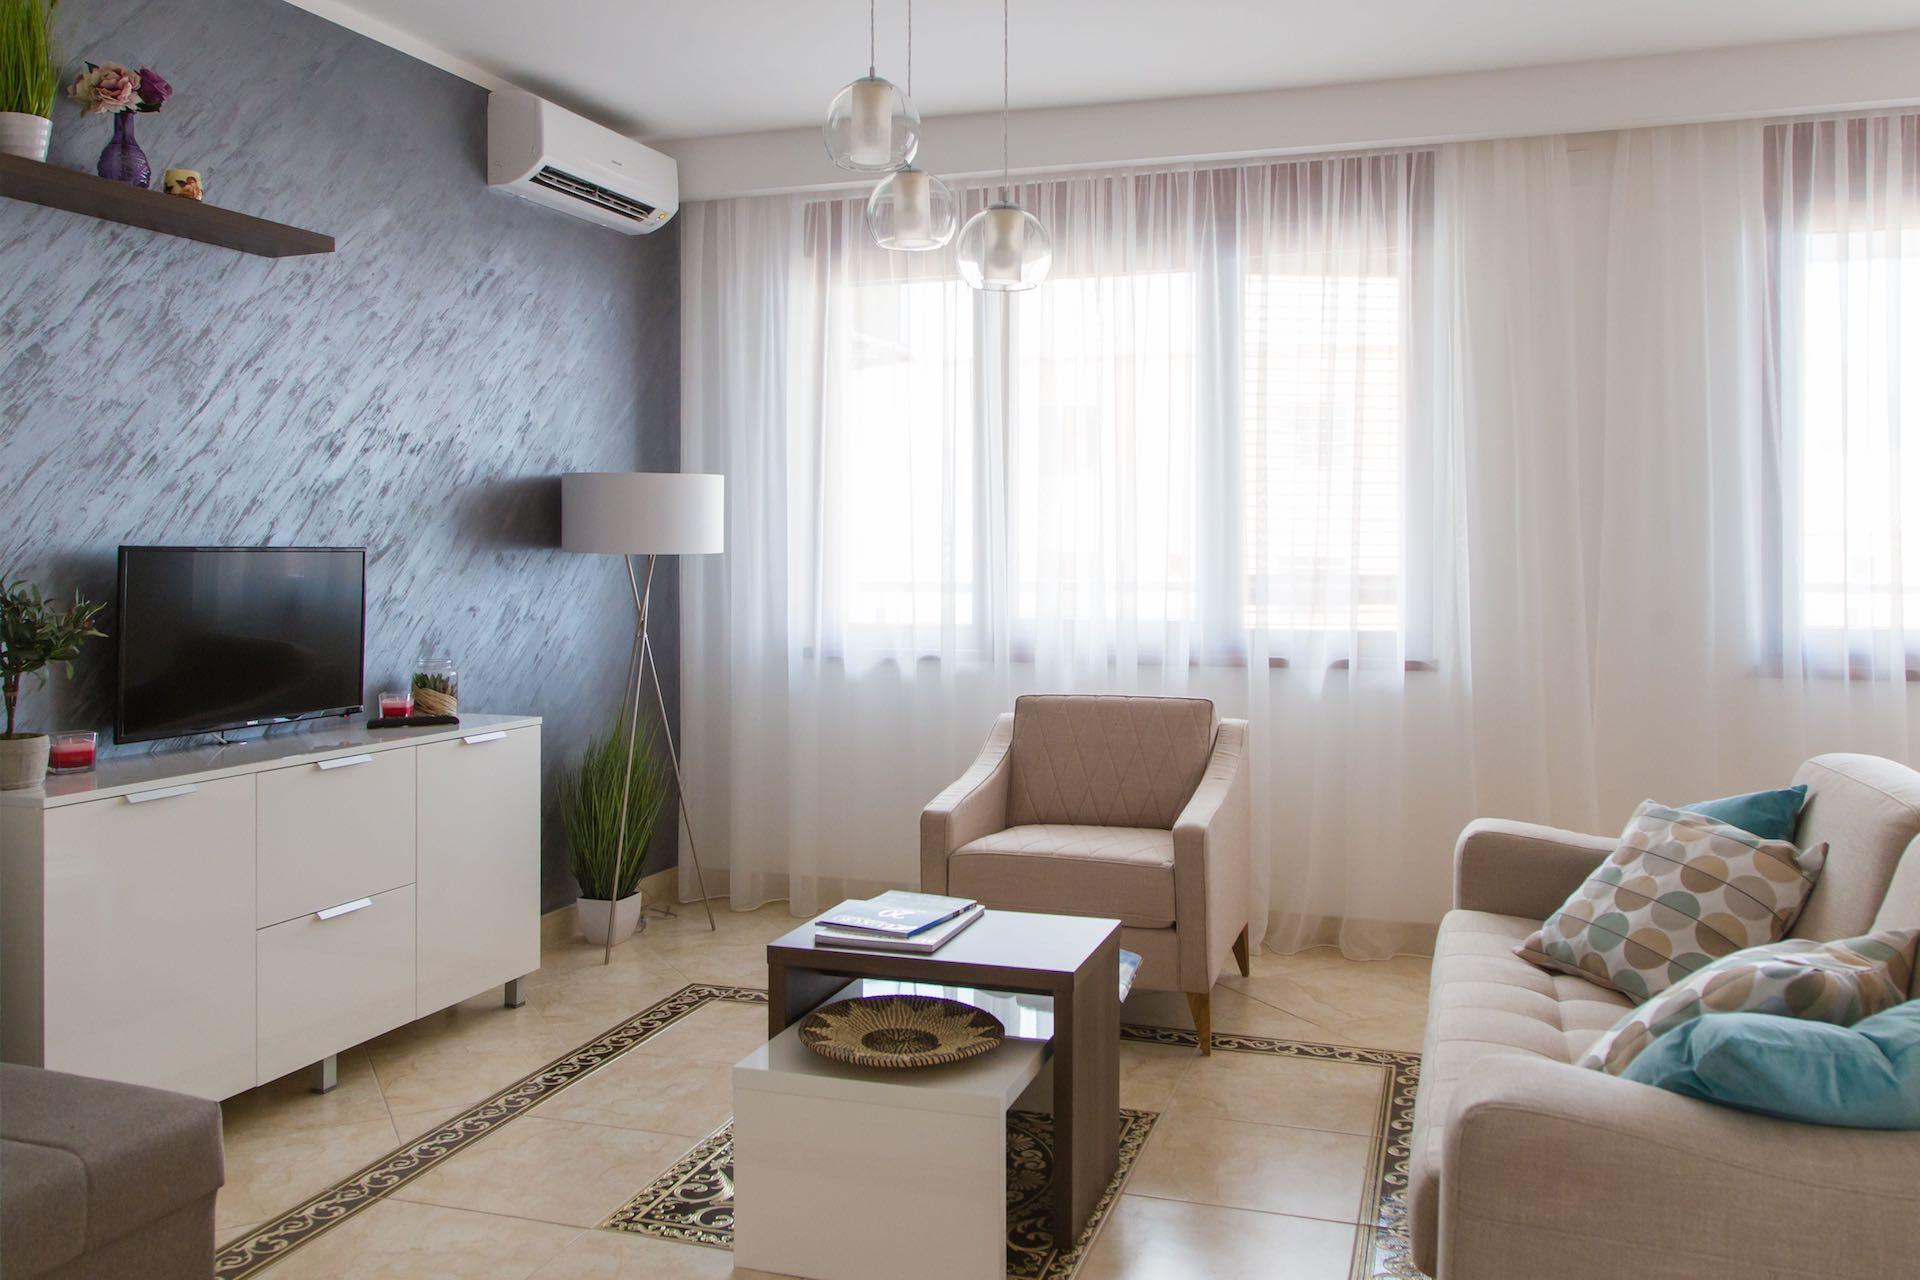 One Bedroom Apartments Aparthotel Anatolia Becici Budva Montenegro Best Hotel Book Now.jpg